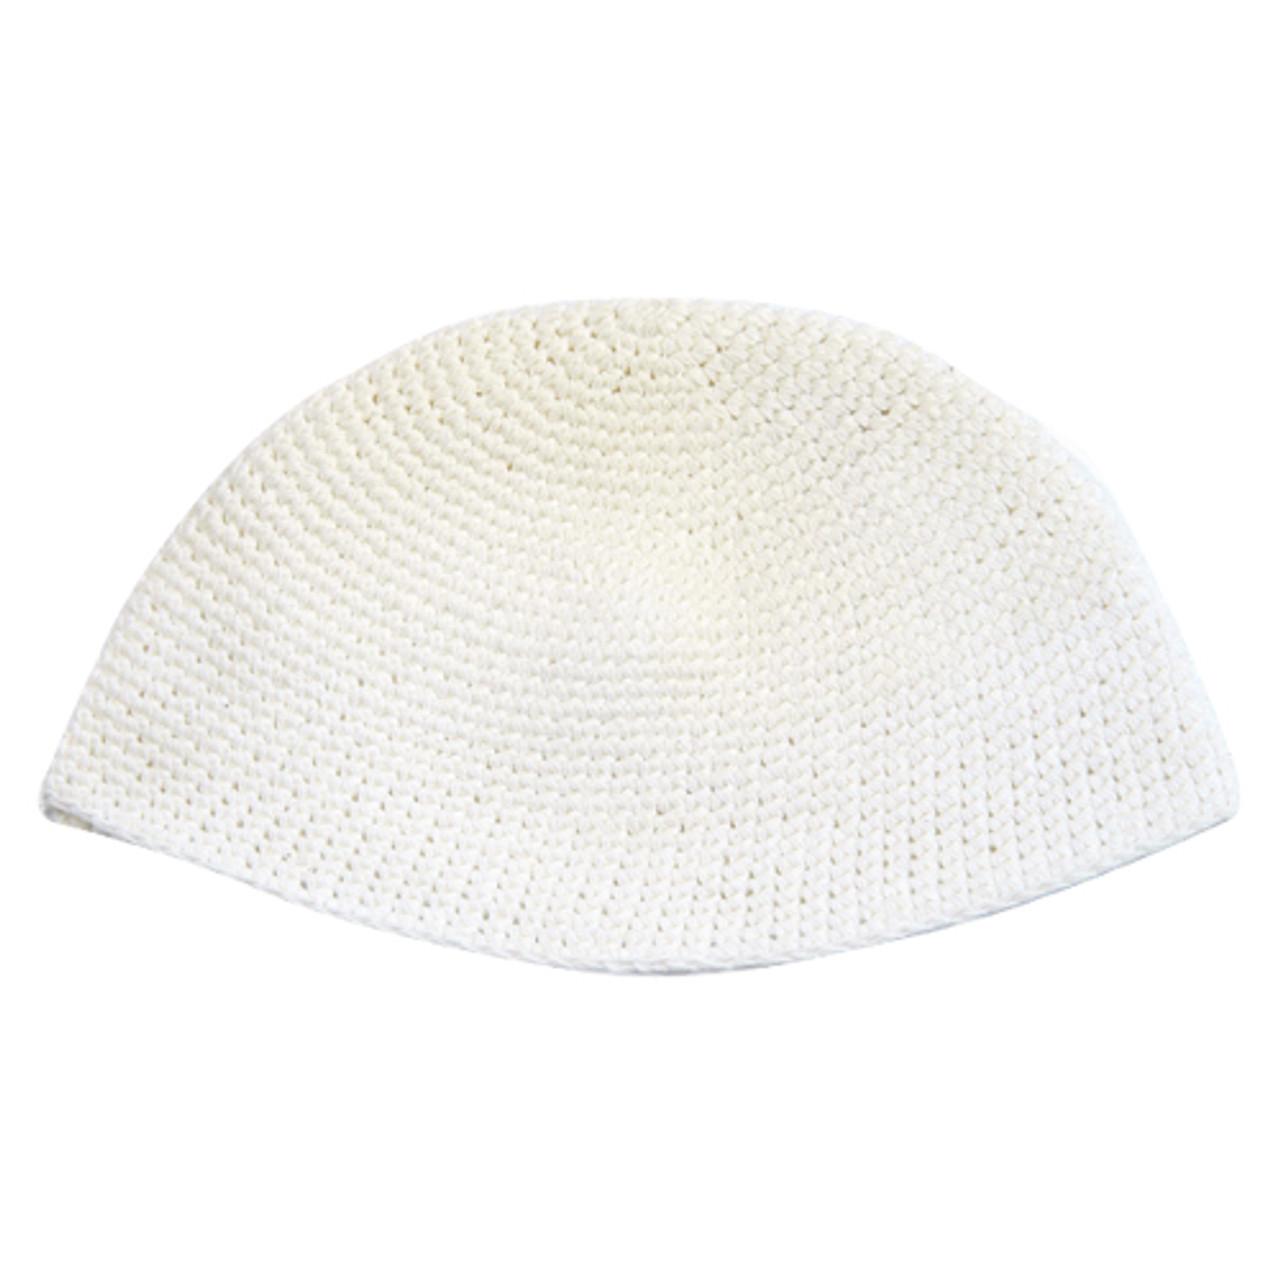 Extra Large White Knitted Kippah